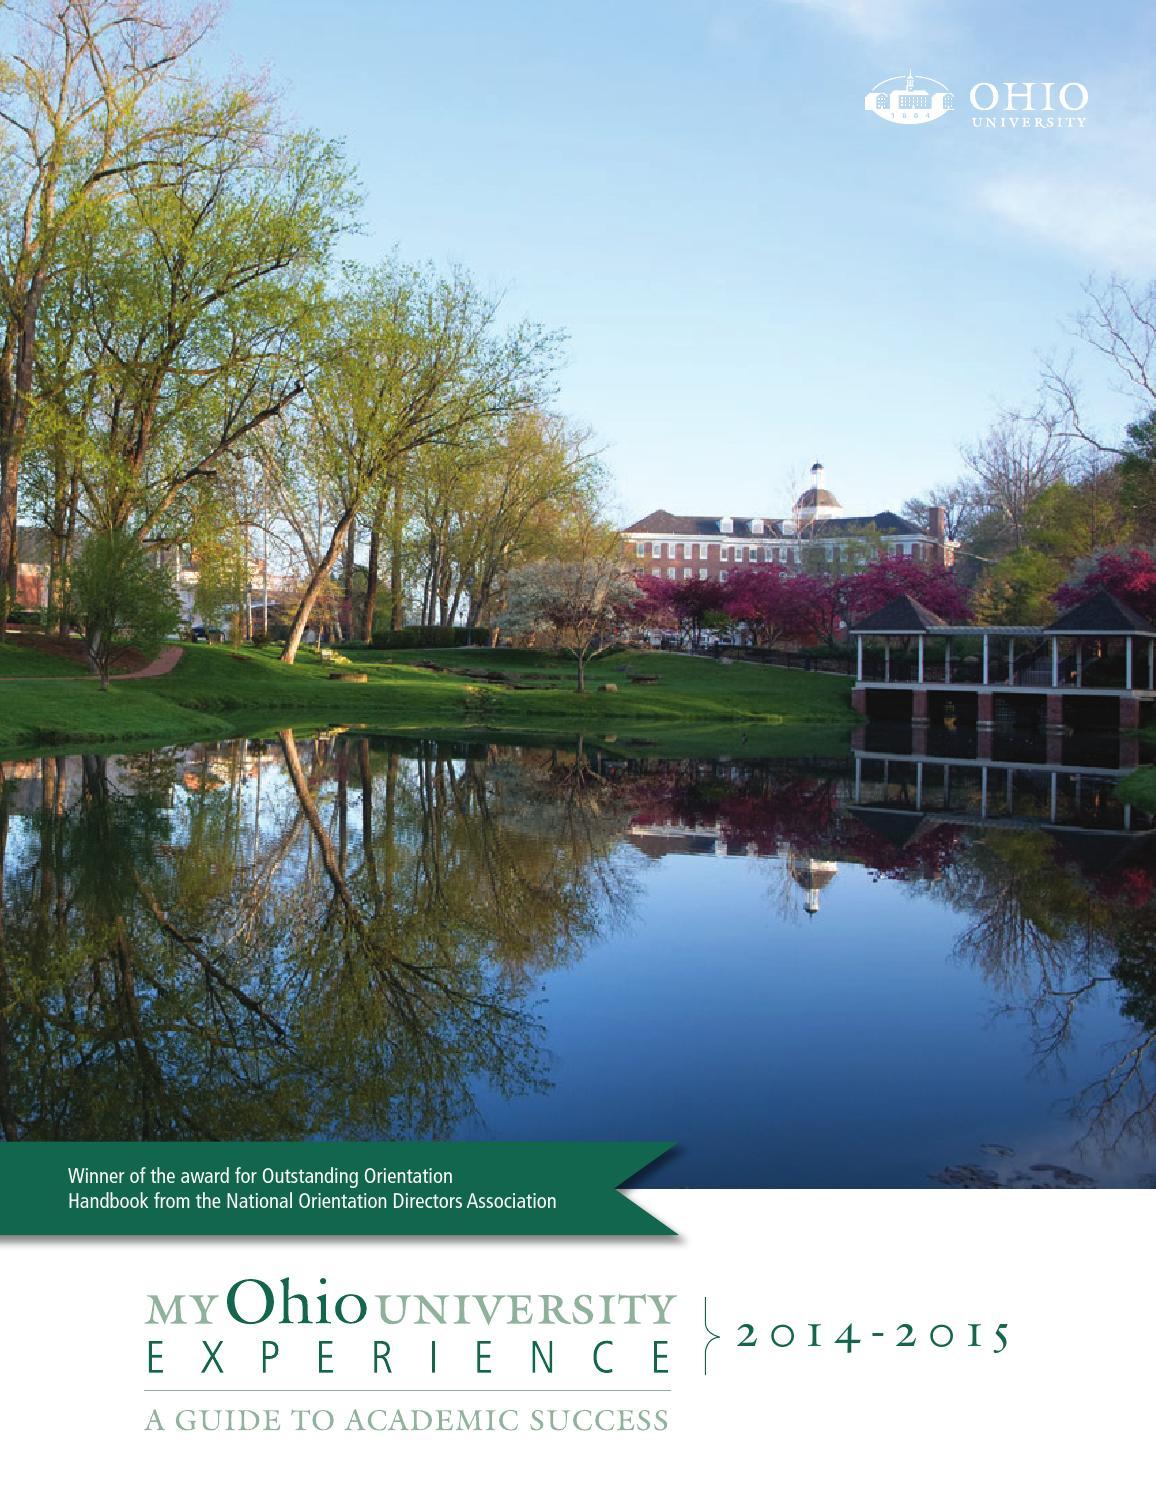 ohio university application essay prompts Homework help biology ohio state university admission essay prompt how do i write an essay professional college essay writer.